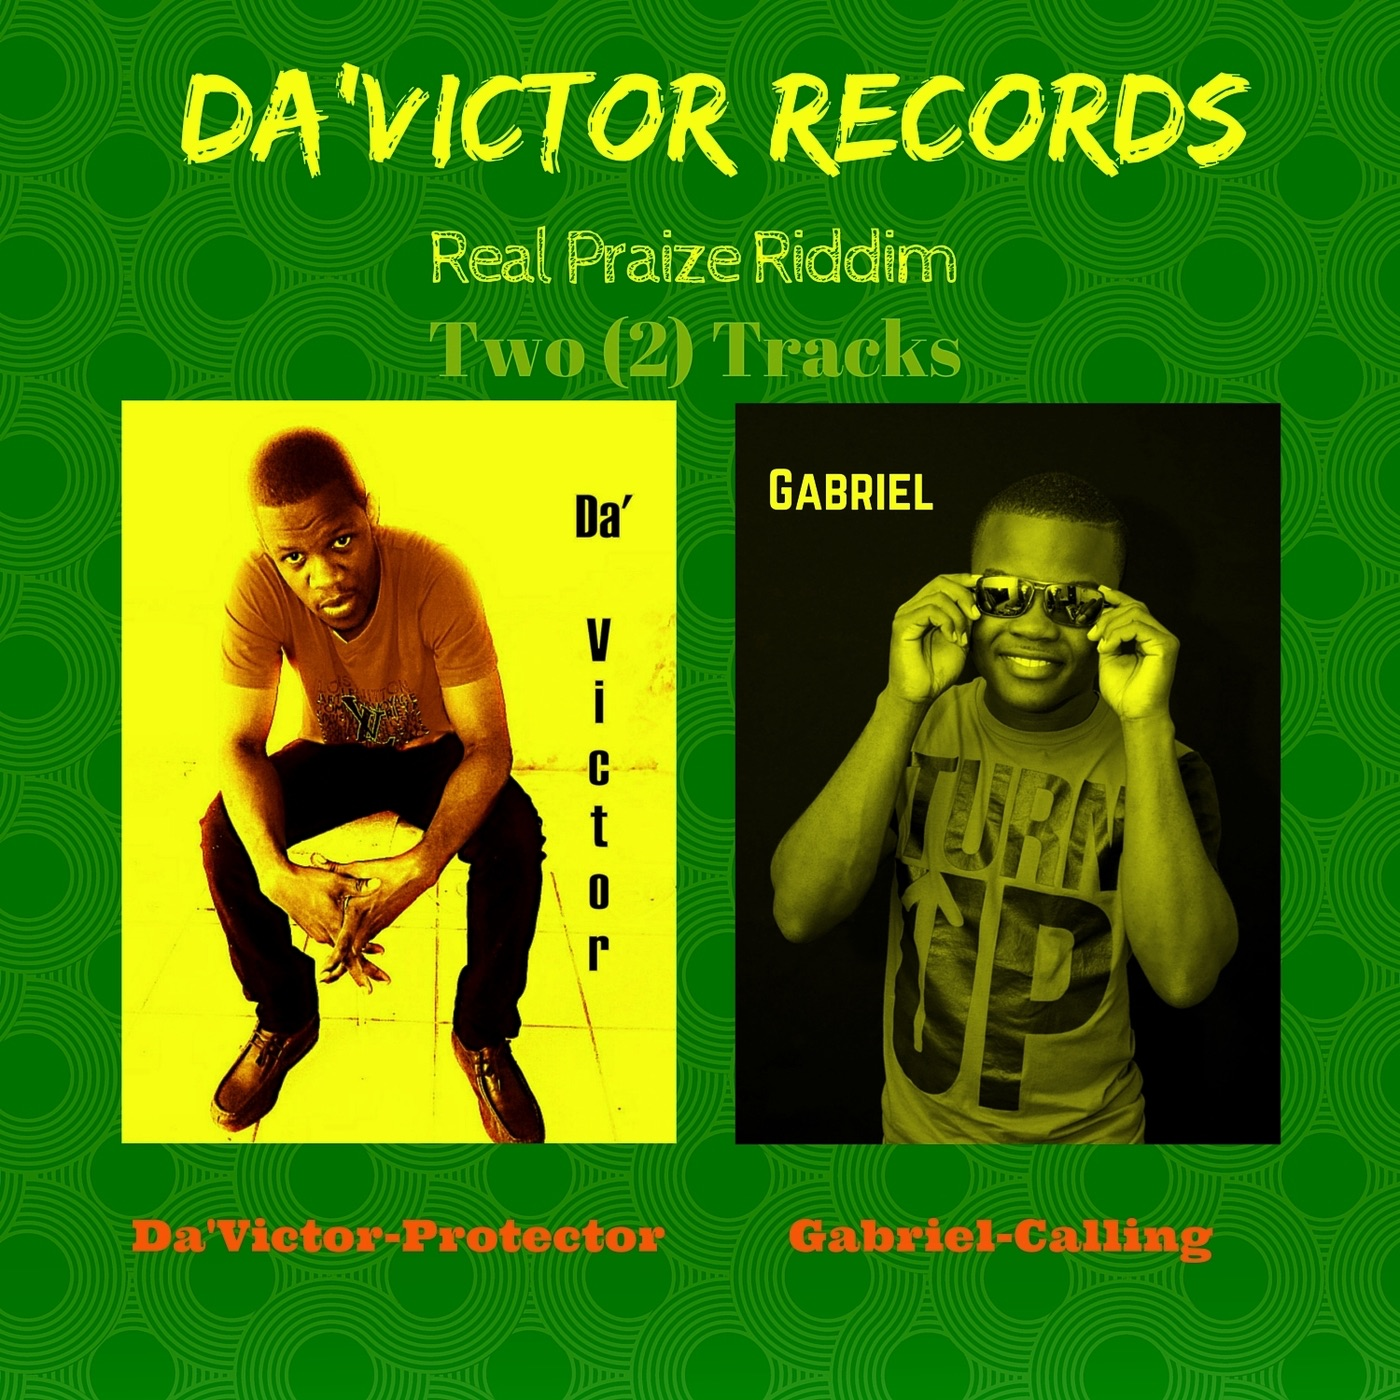 Real Praize Riddim - Single